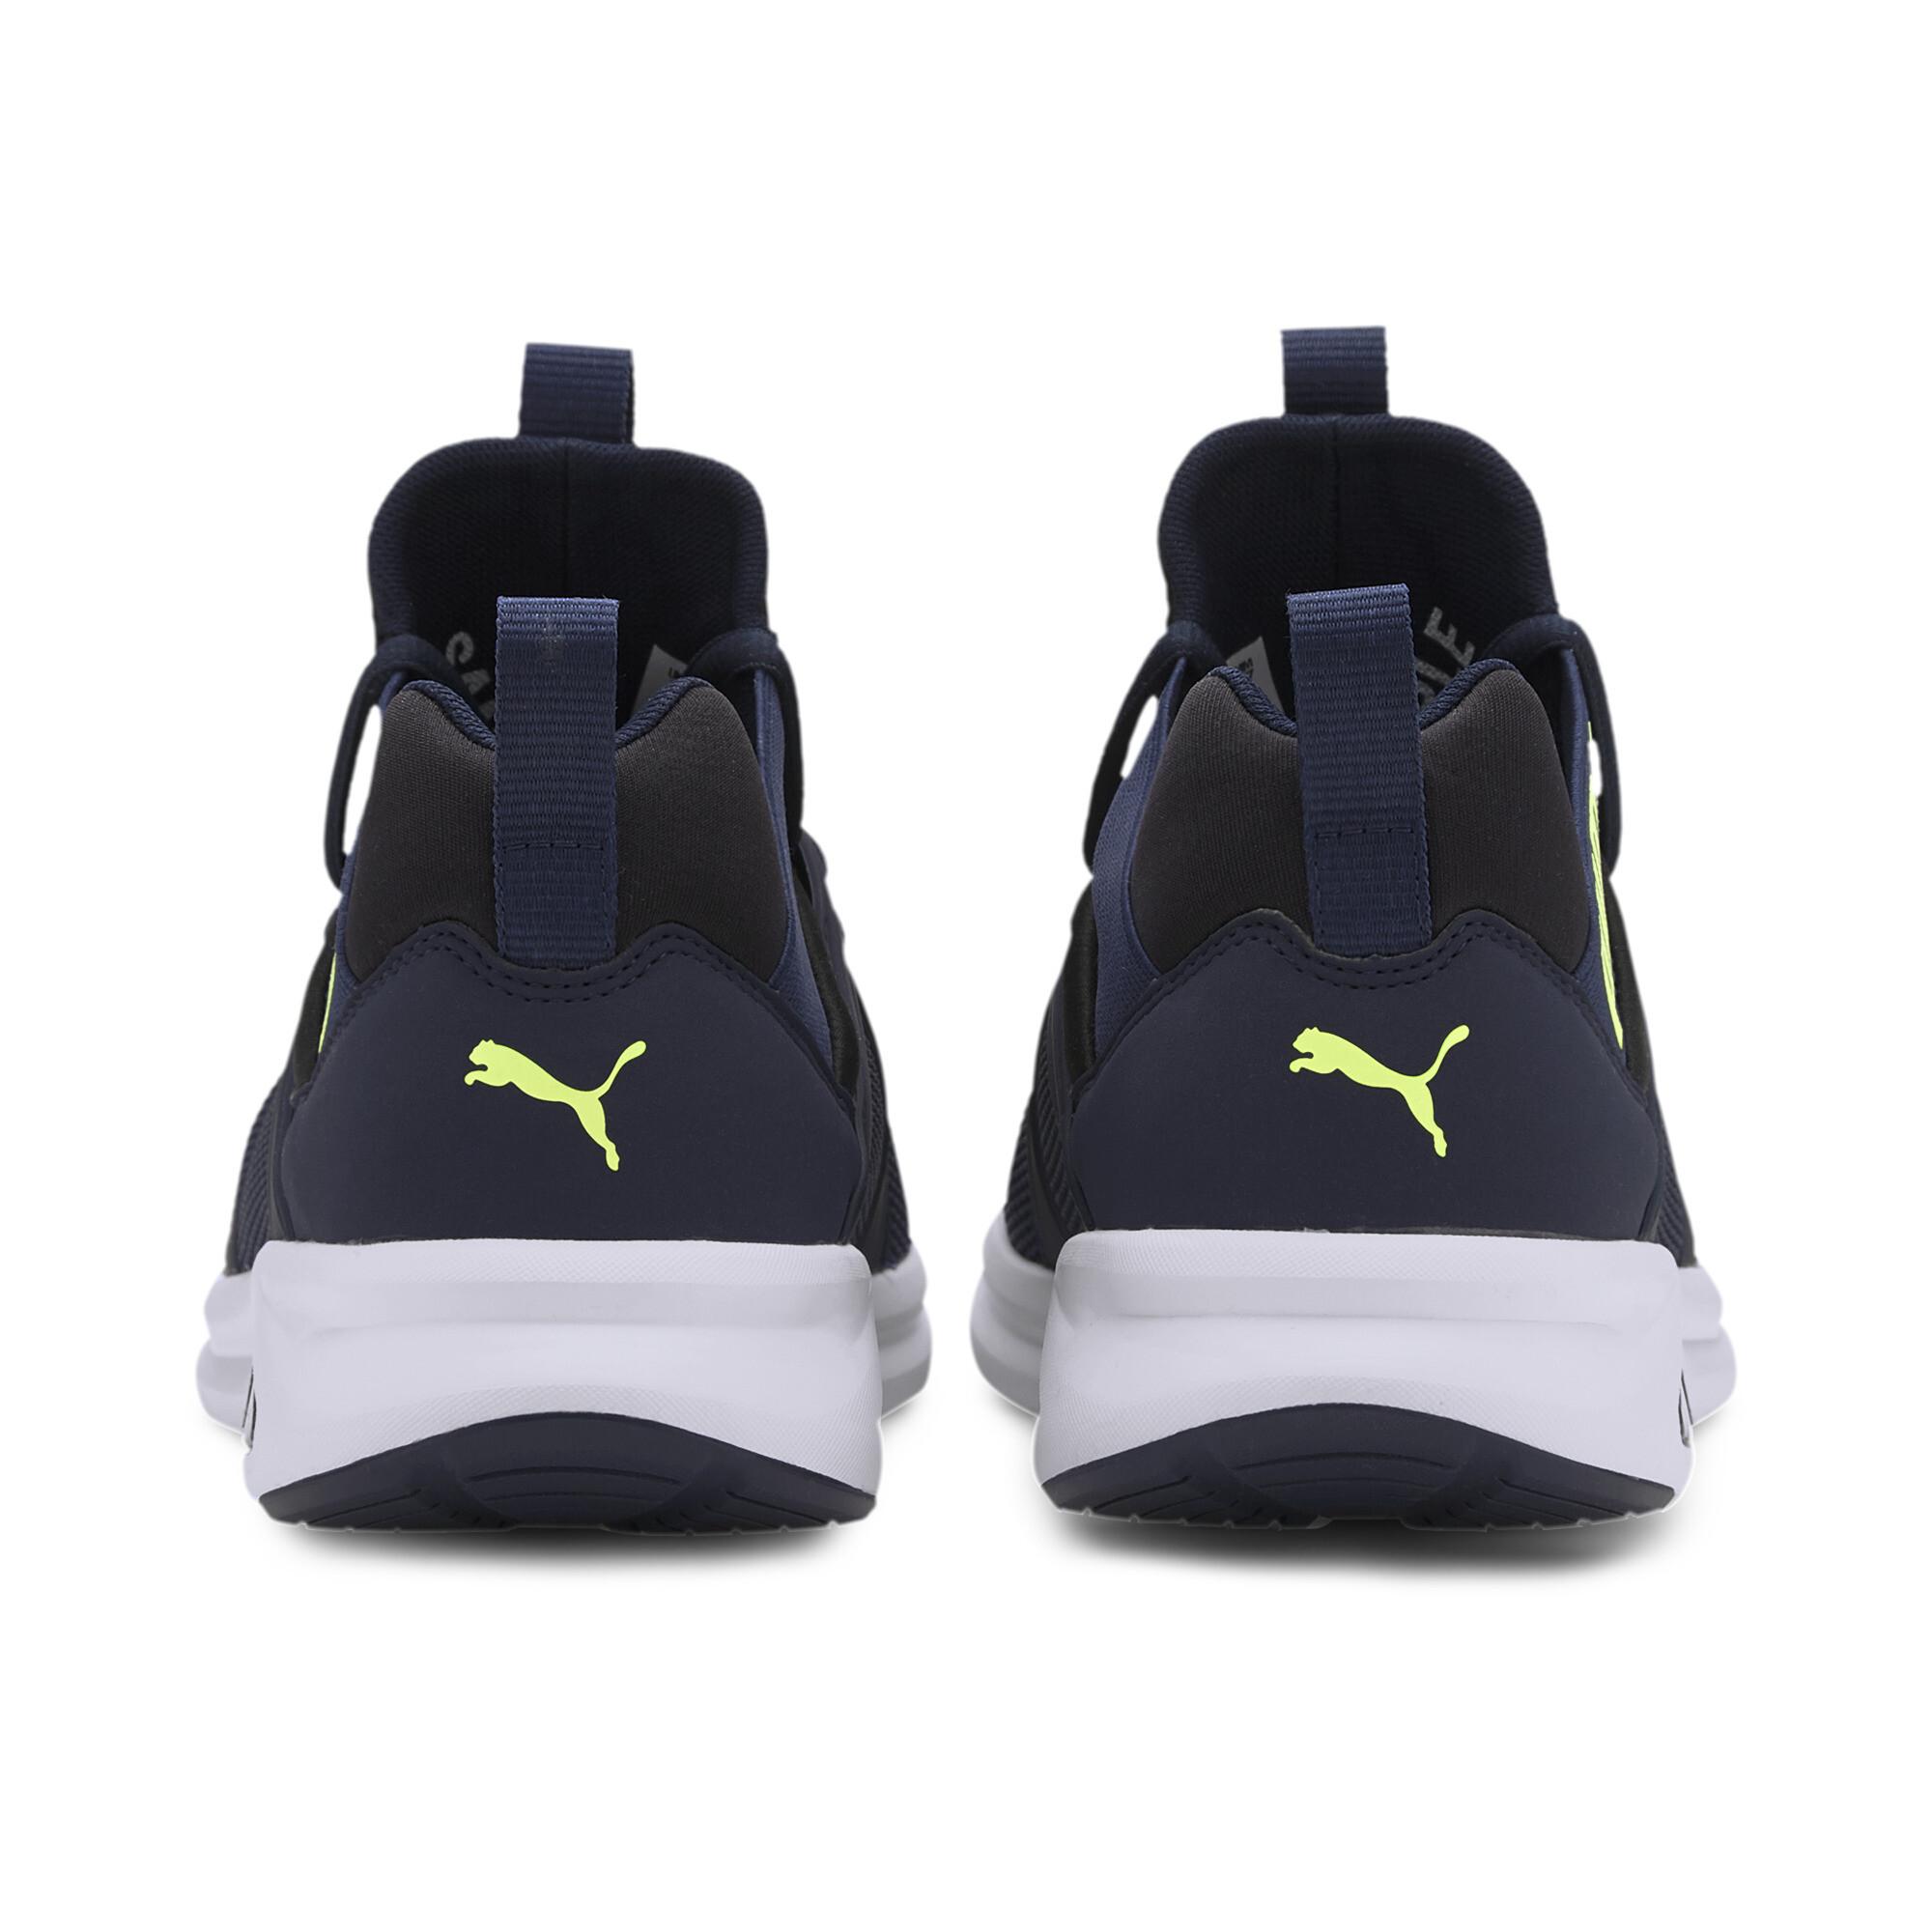 PUMA-Men-039-s-Enzo-2-Wide-Training-Shoes thumbnail 10